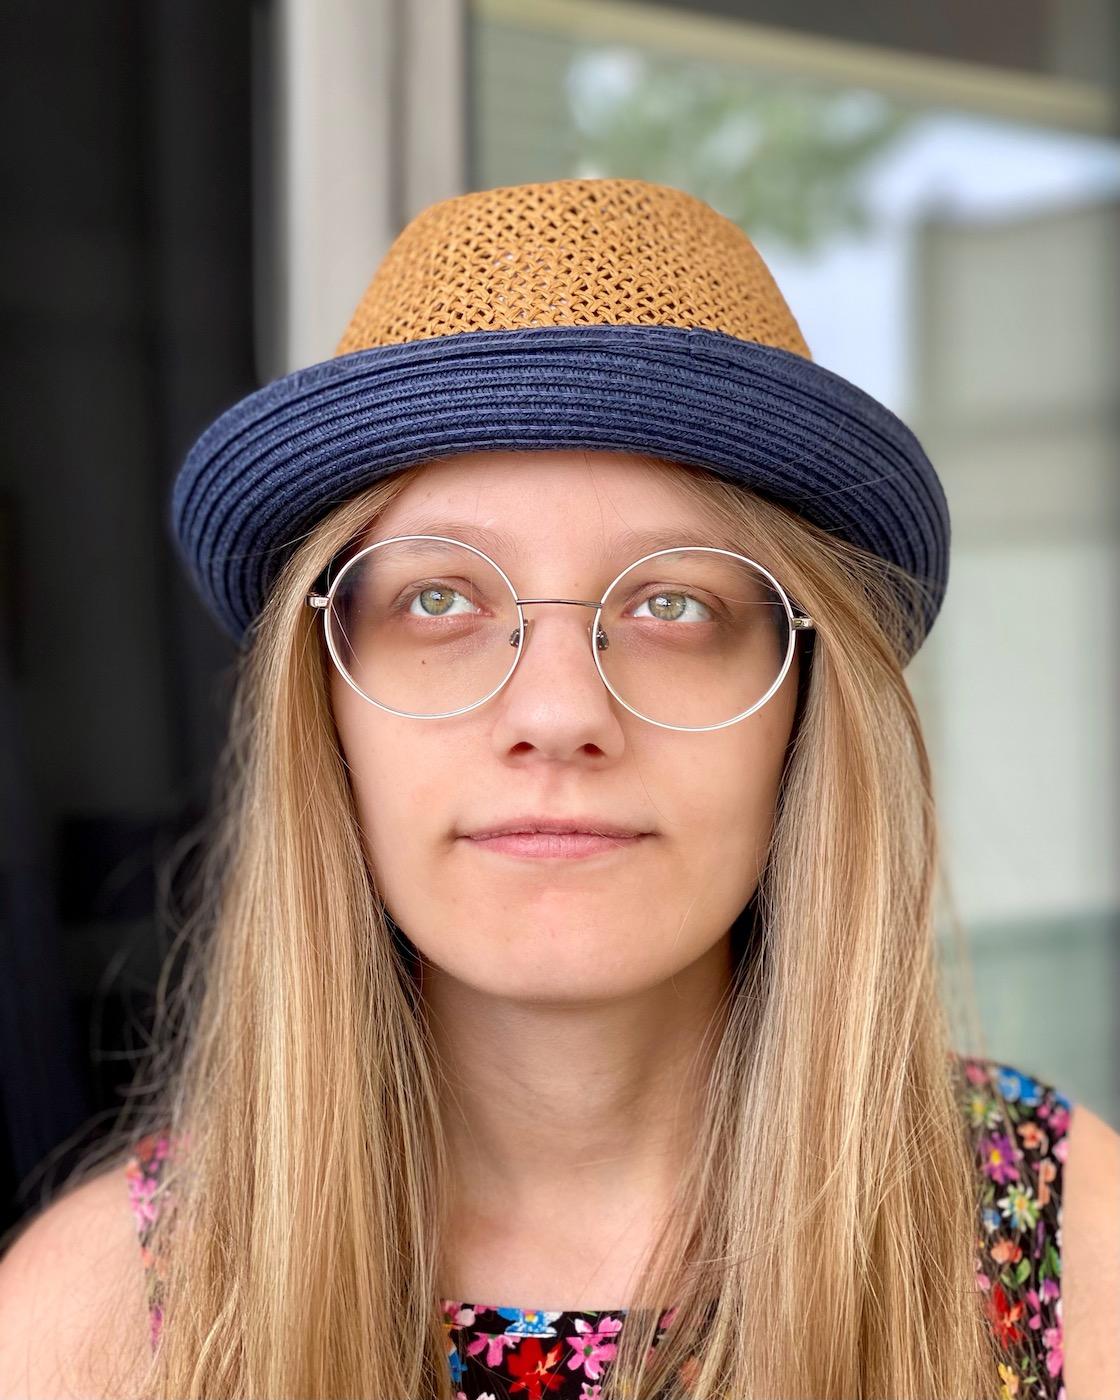 Tochter mit Papas Hut